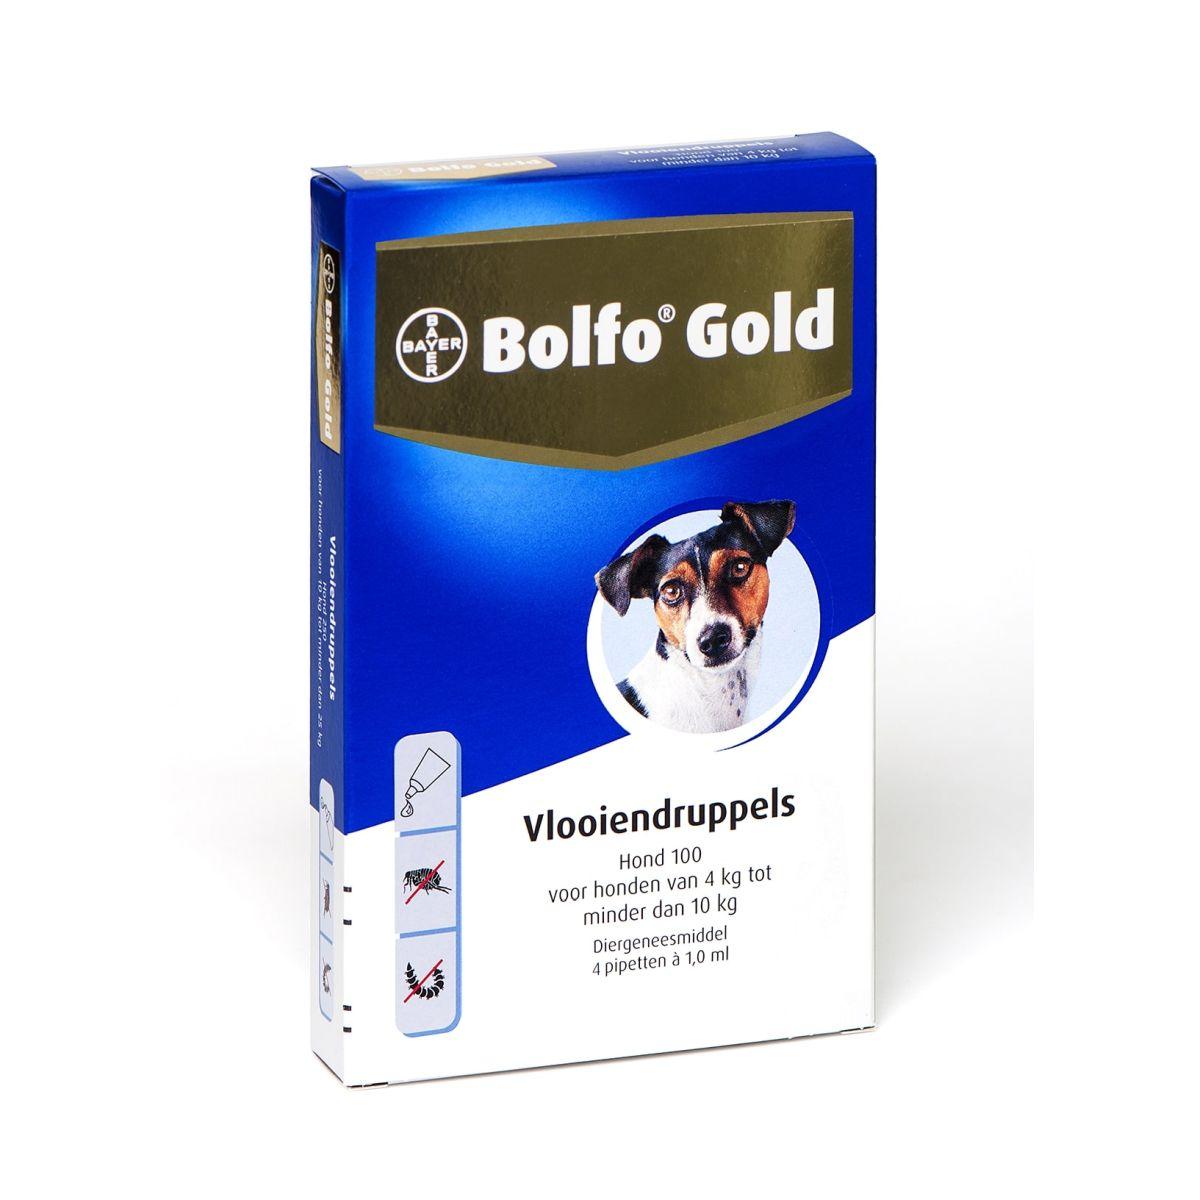 BA BOLFO GOLD HOND 100 4PIP 00001